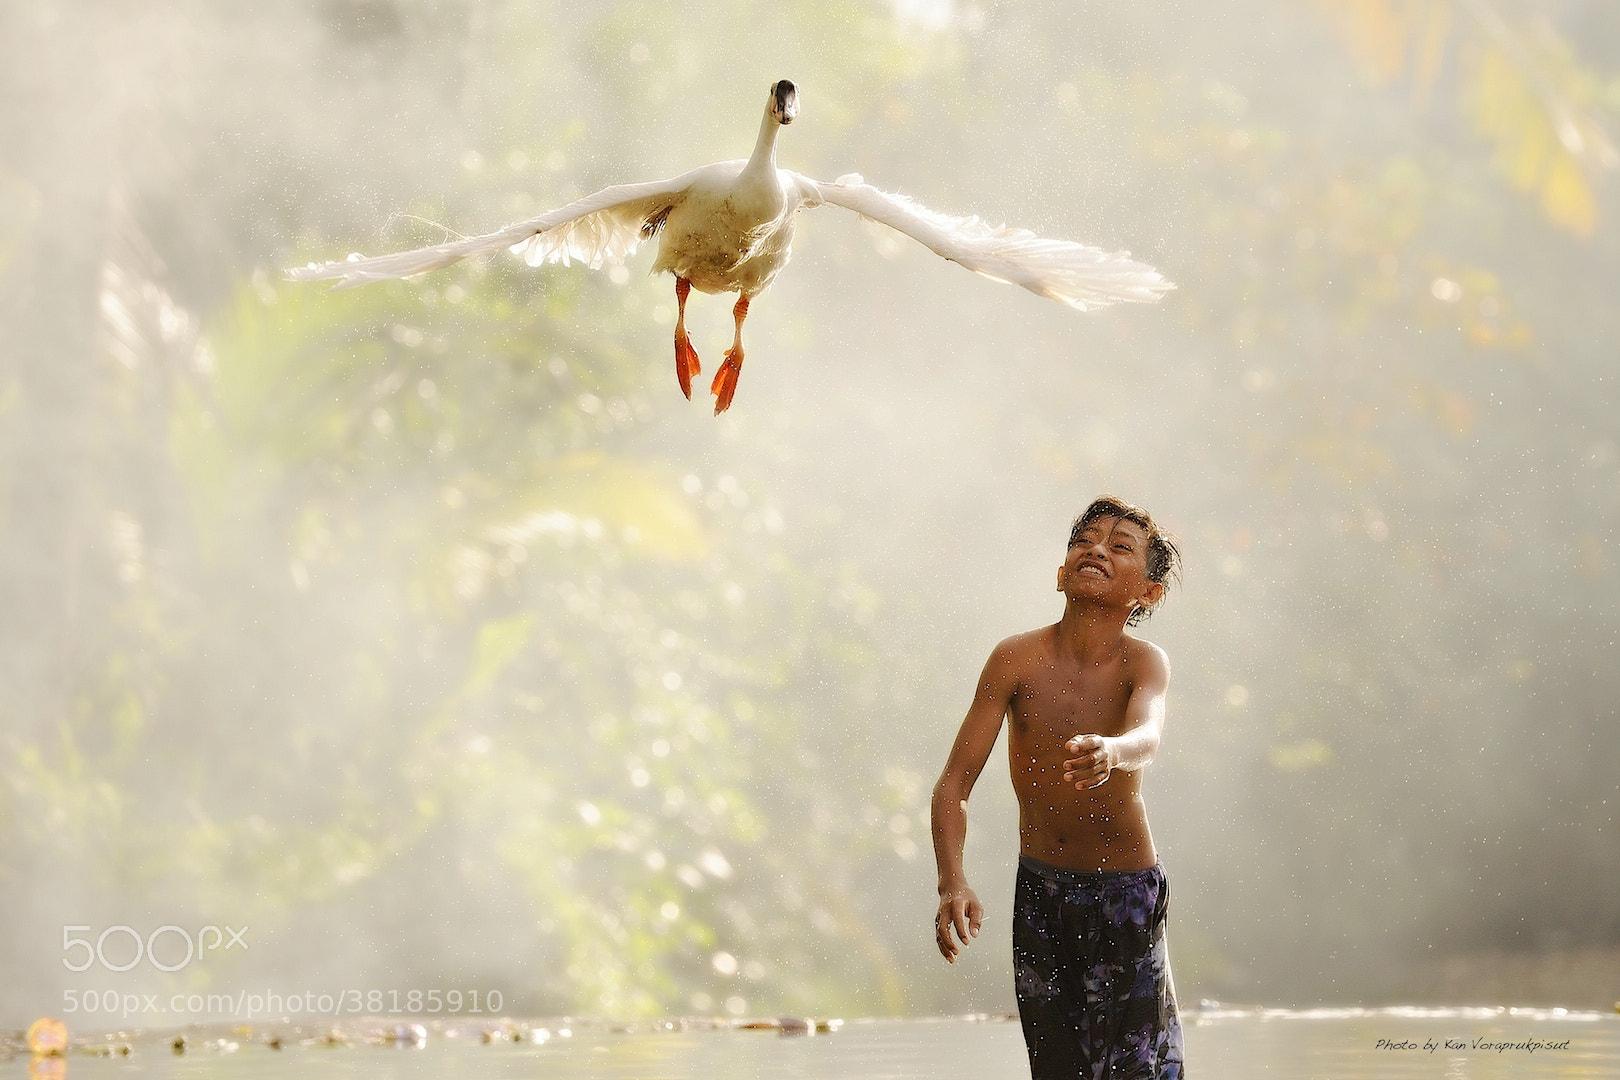 Photograph GO.. by Kan Voraprukpisut on 500px